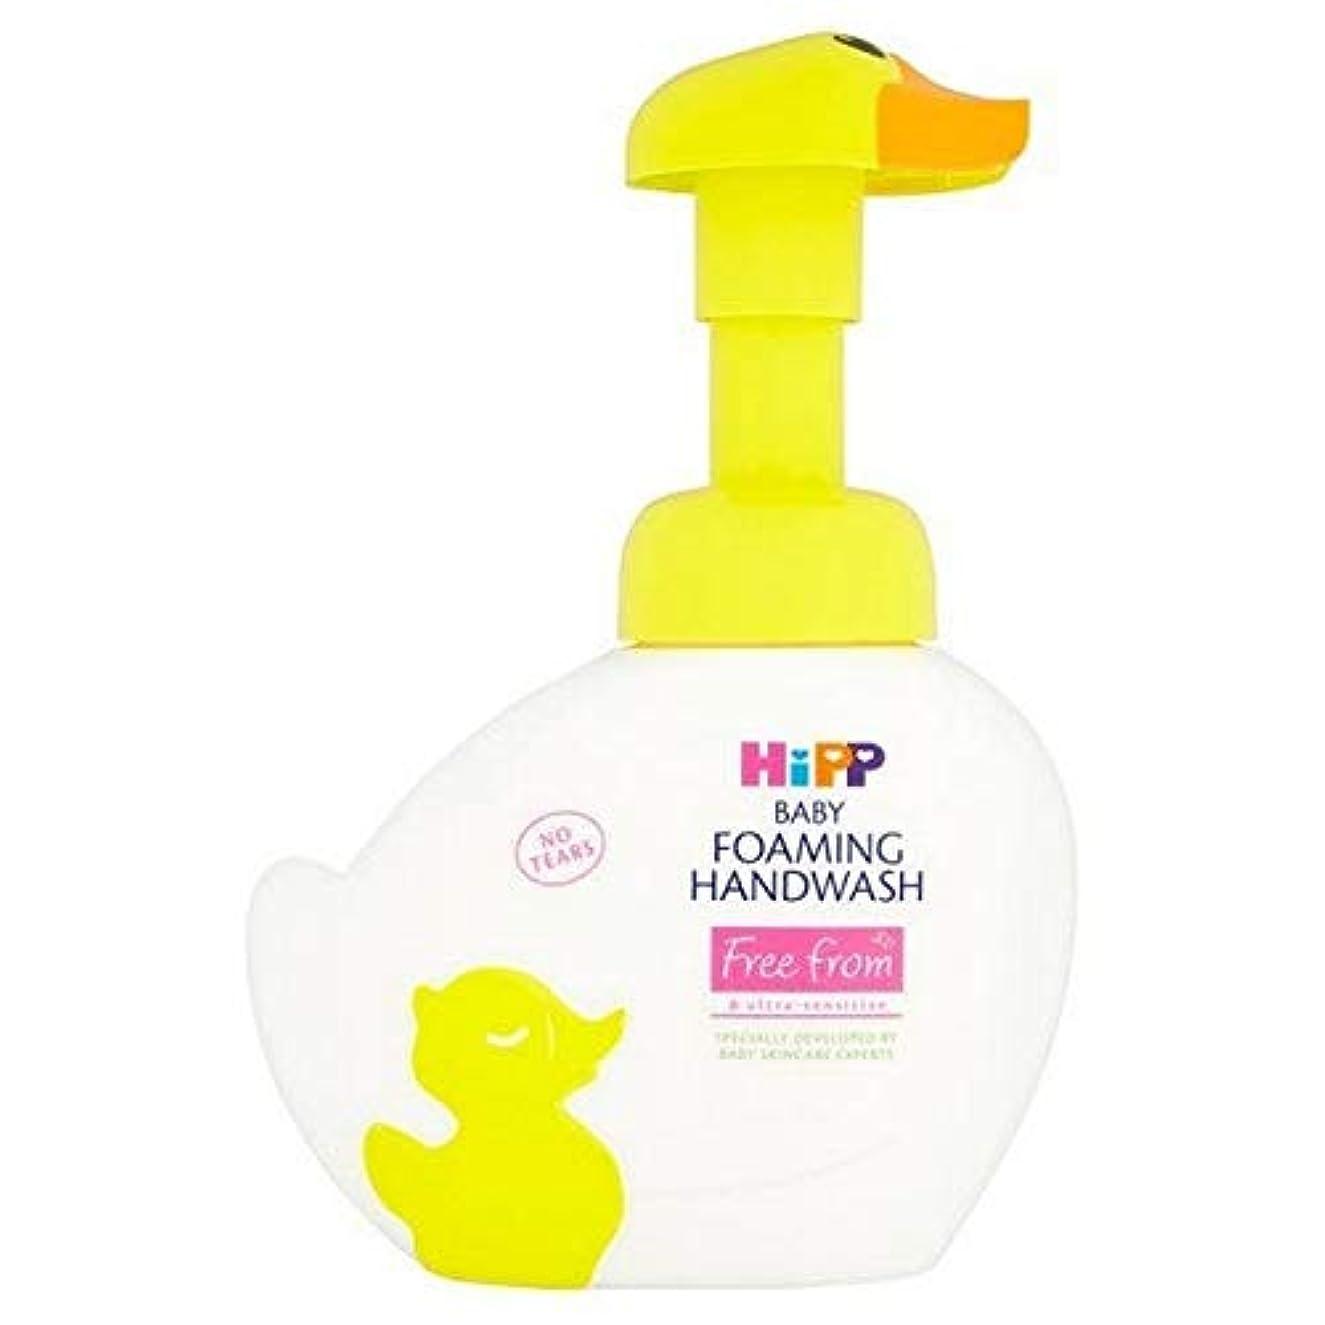 [Hipp ] ヒップ自由手洗いの250ミリリットルを発泡から - HiPP Free From Foaming Handwash 250ml [並行輸入品]